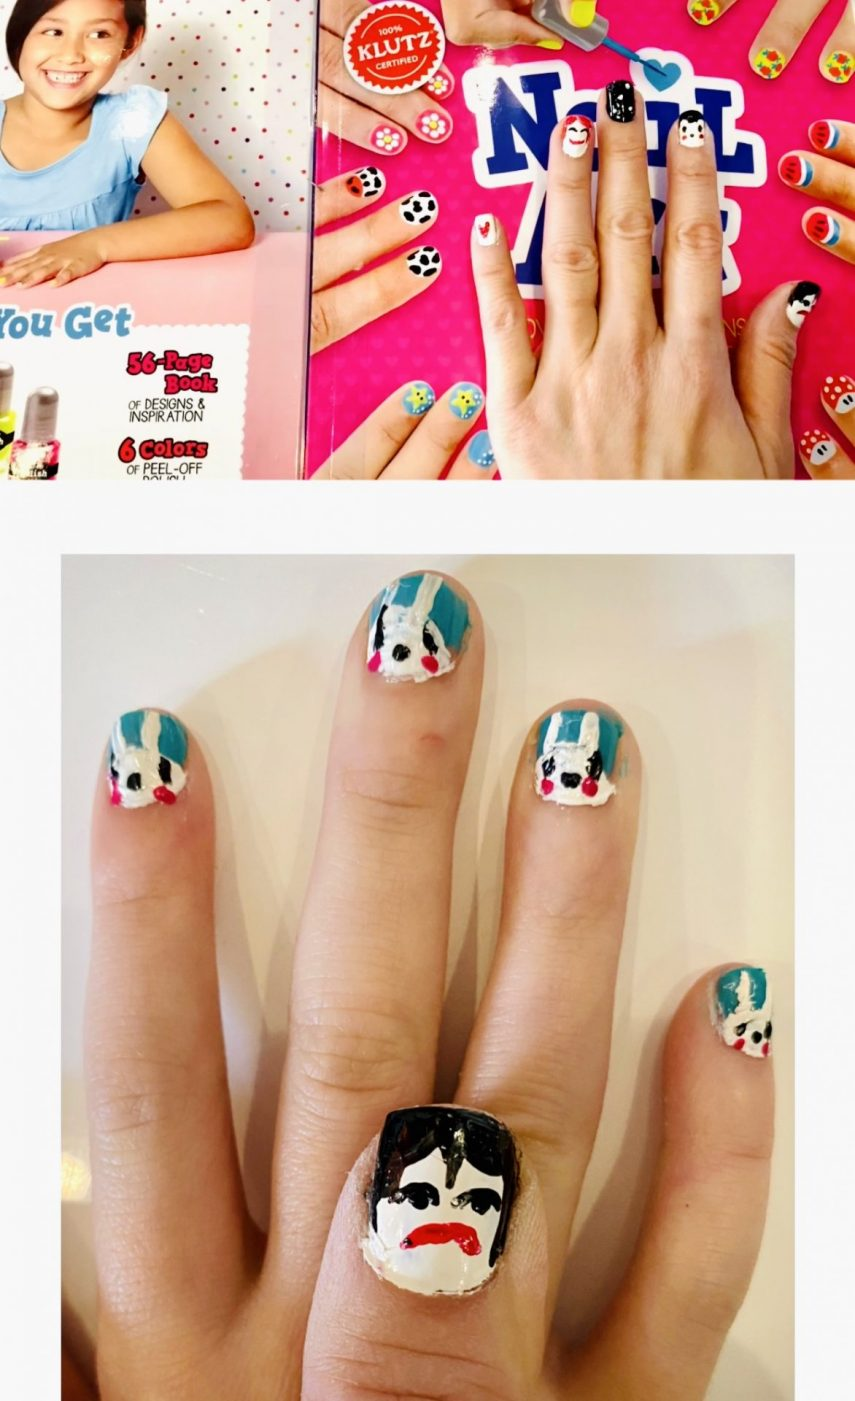 klutz kids, kids nails, kids nail art